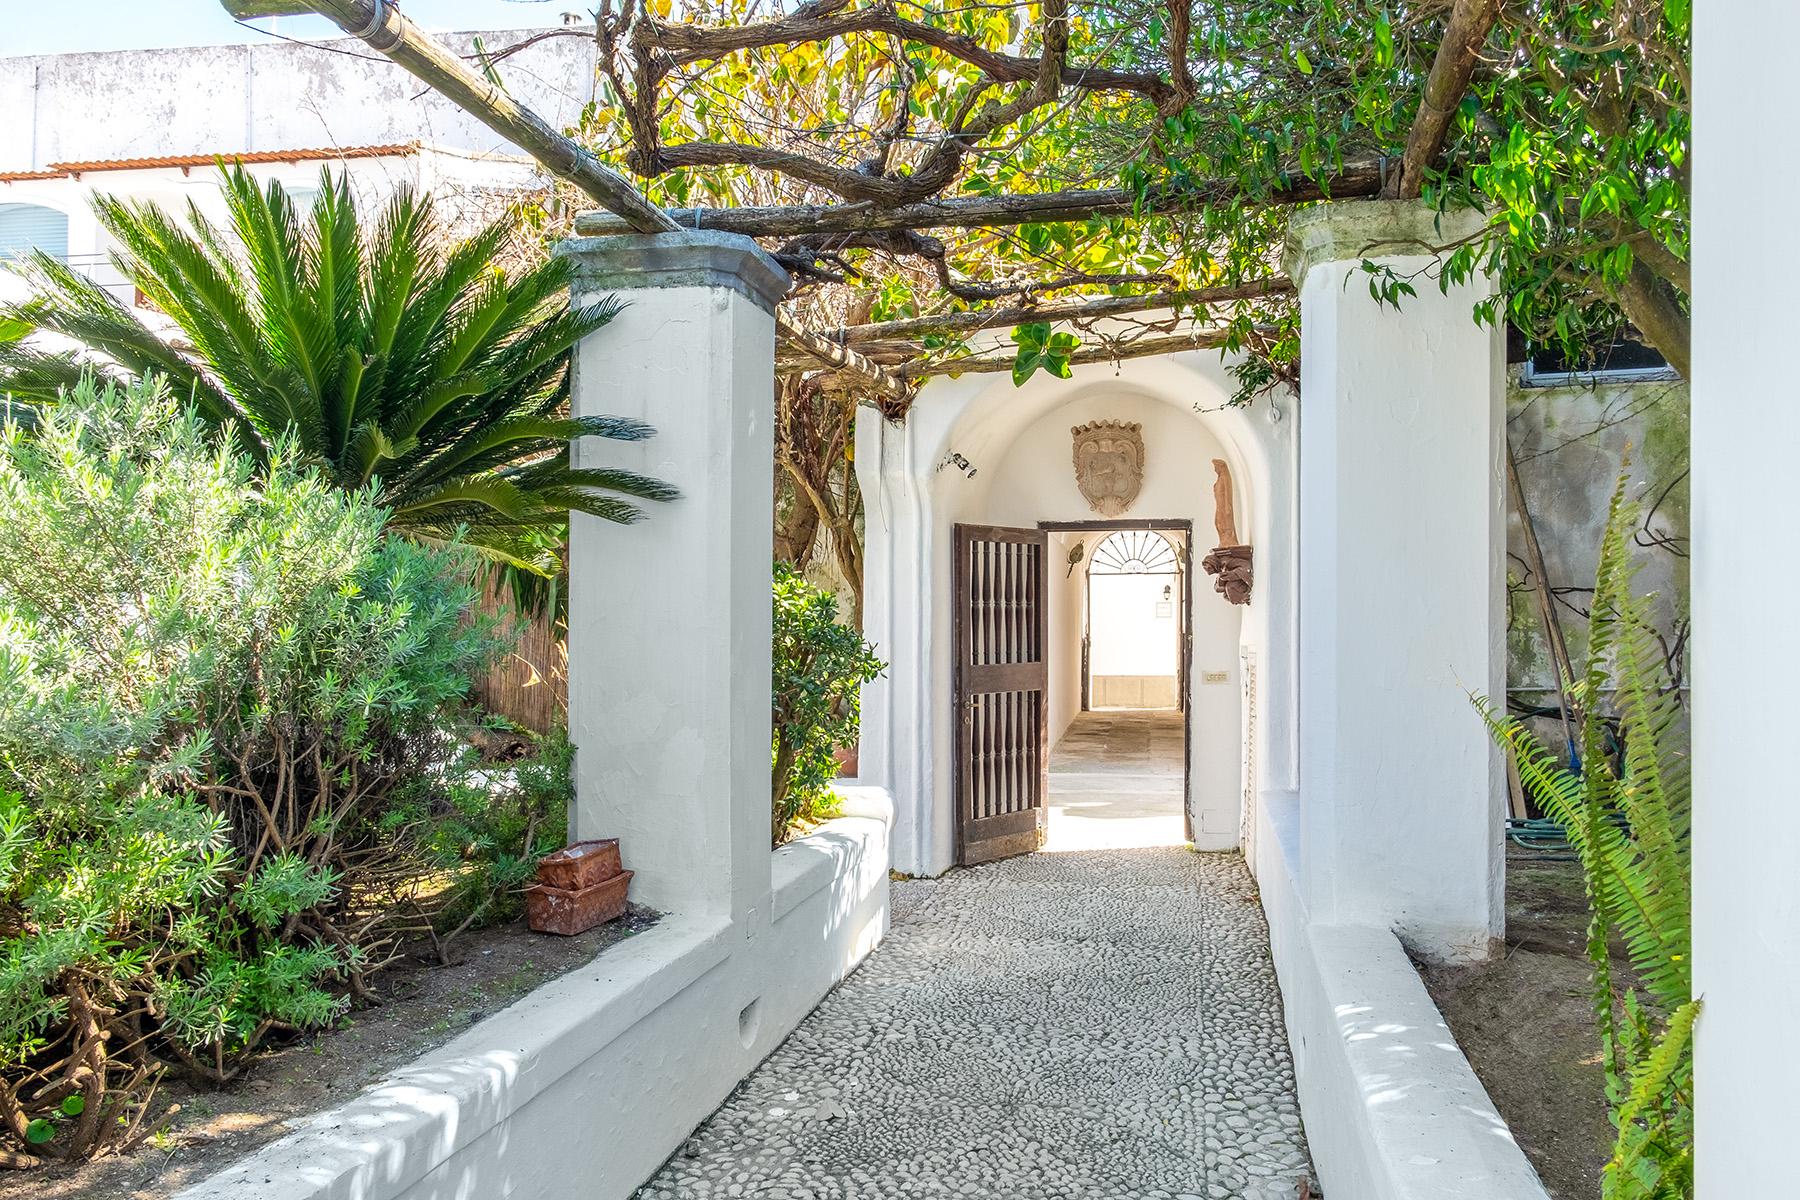 Casa indipendente in Vendita a Capri: 5 locali, 300 mq - Foto 6